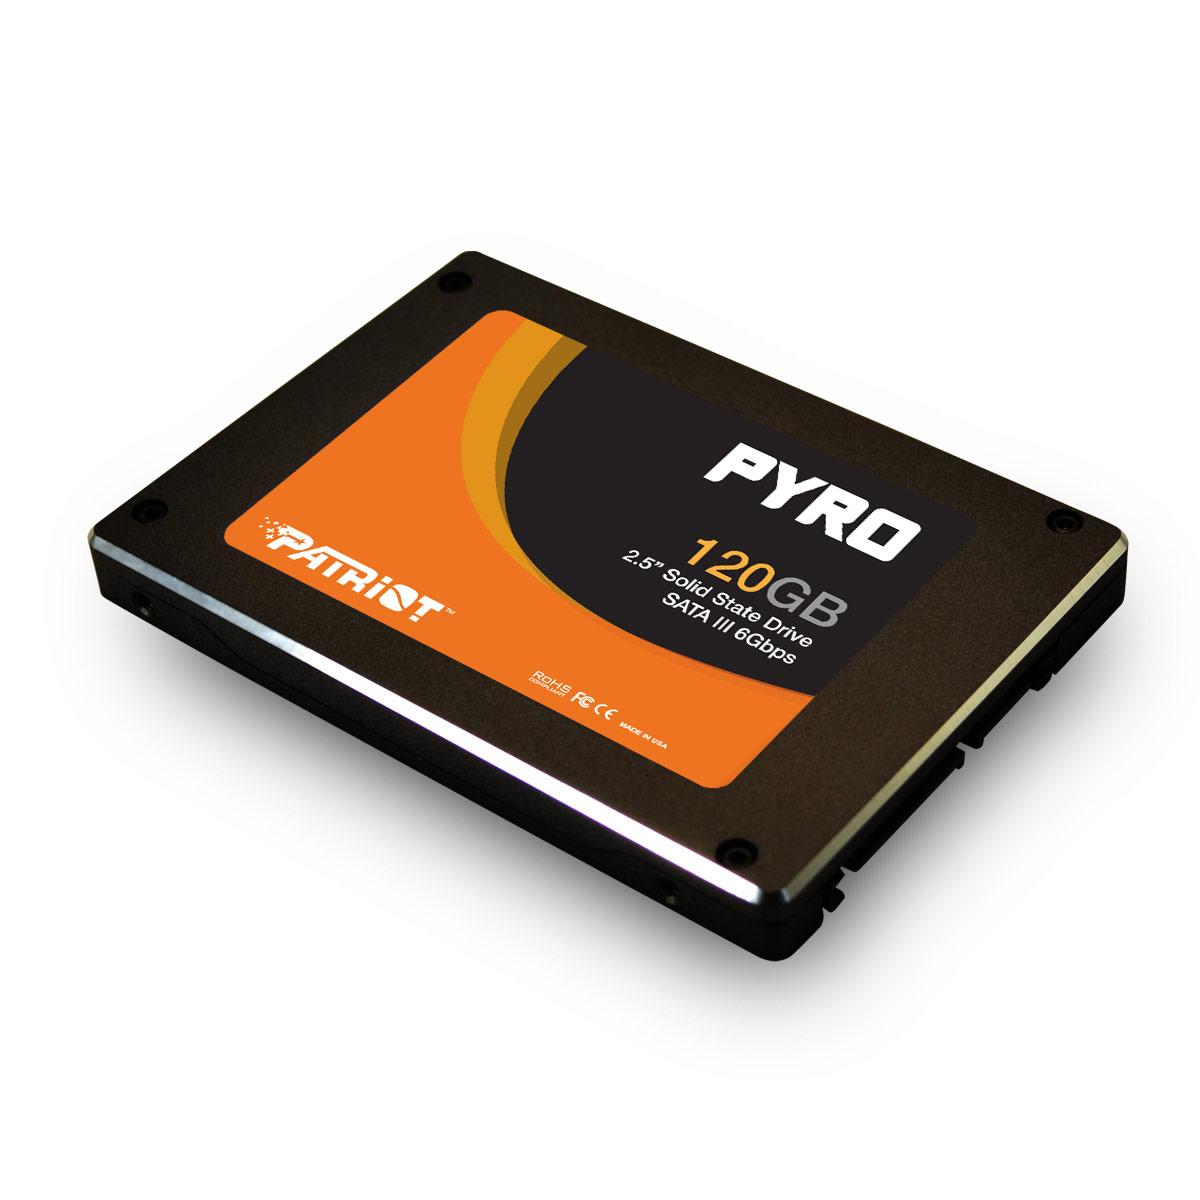 Patriot SSD Pyro 120GB SATA III 6Gb/s (čtení/zápis; 550/530MB/s)IOPS 85K